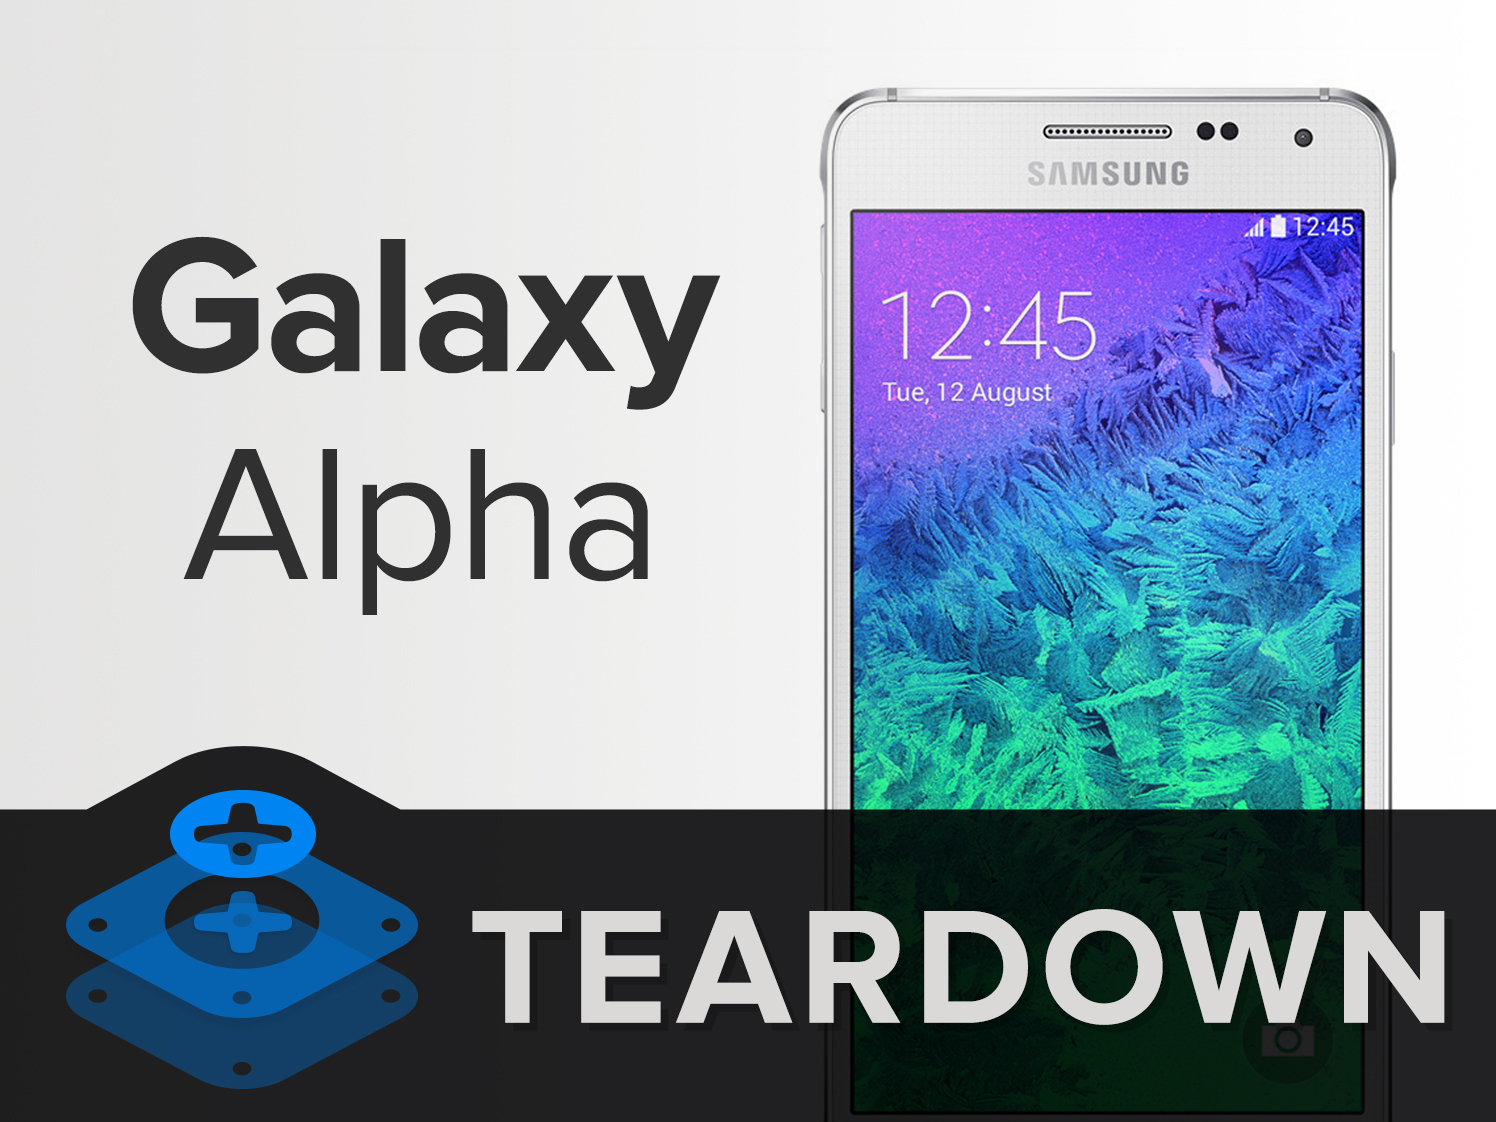 Samsung Galaxy Alpha Teardown Ifixit G850